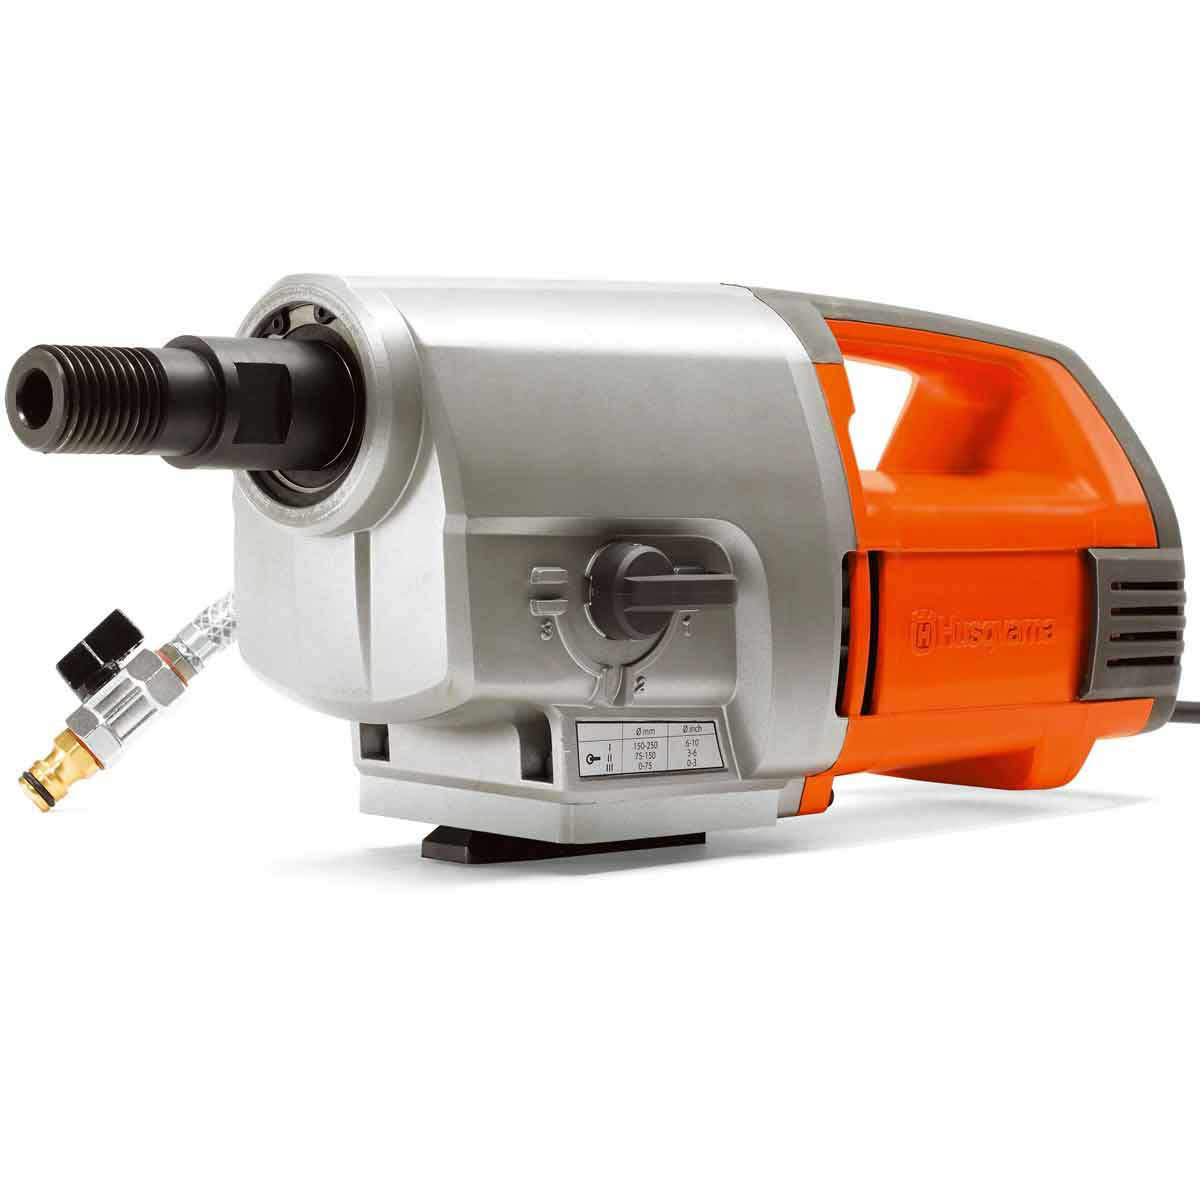 Husqvarna DS-800 Core Drill water